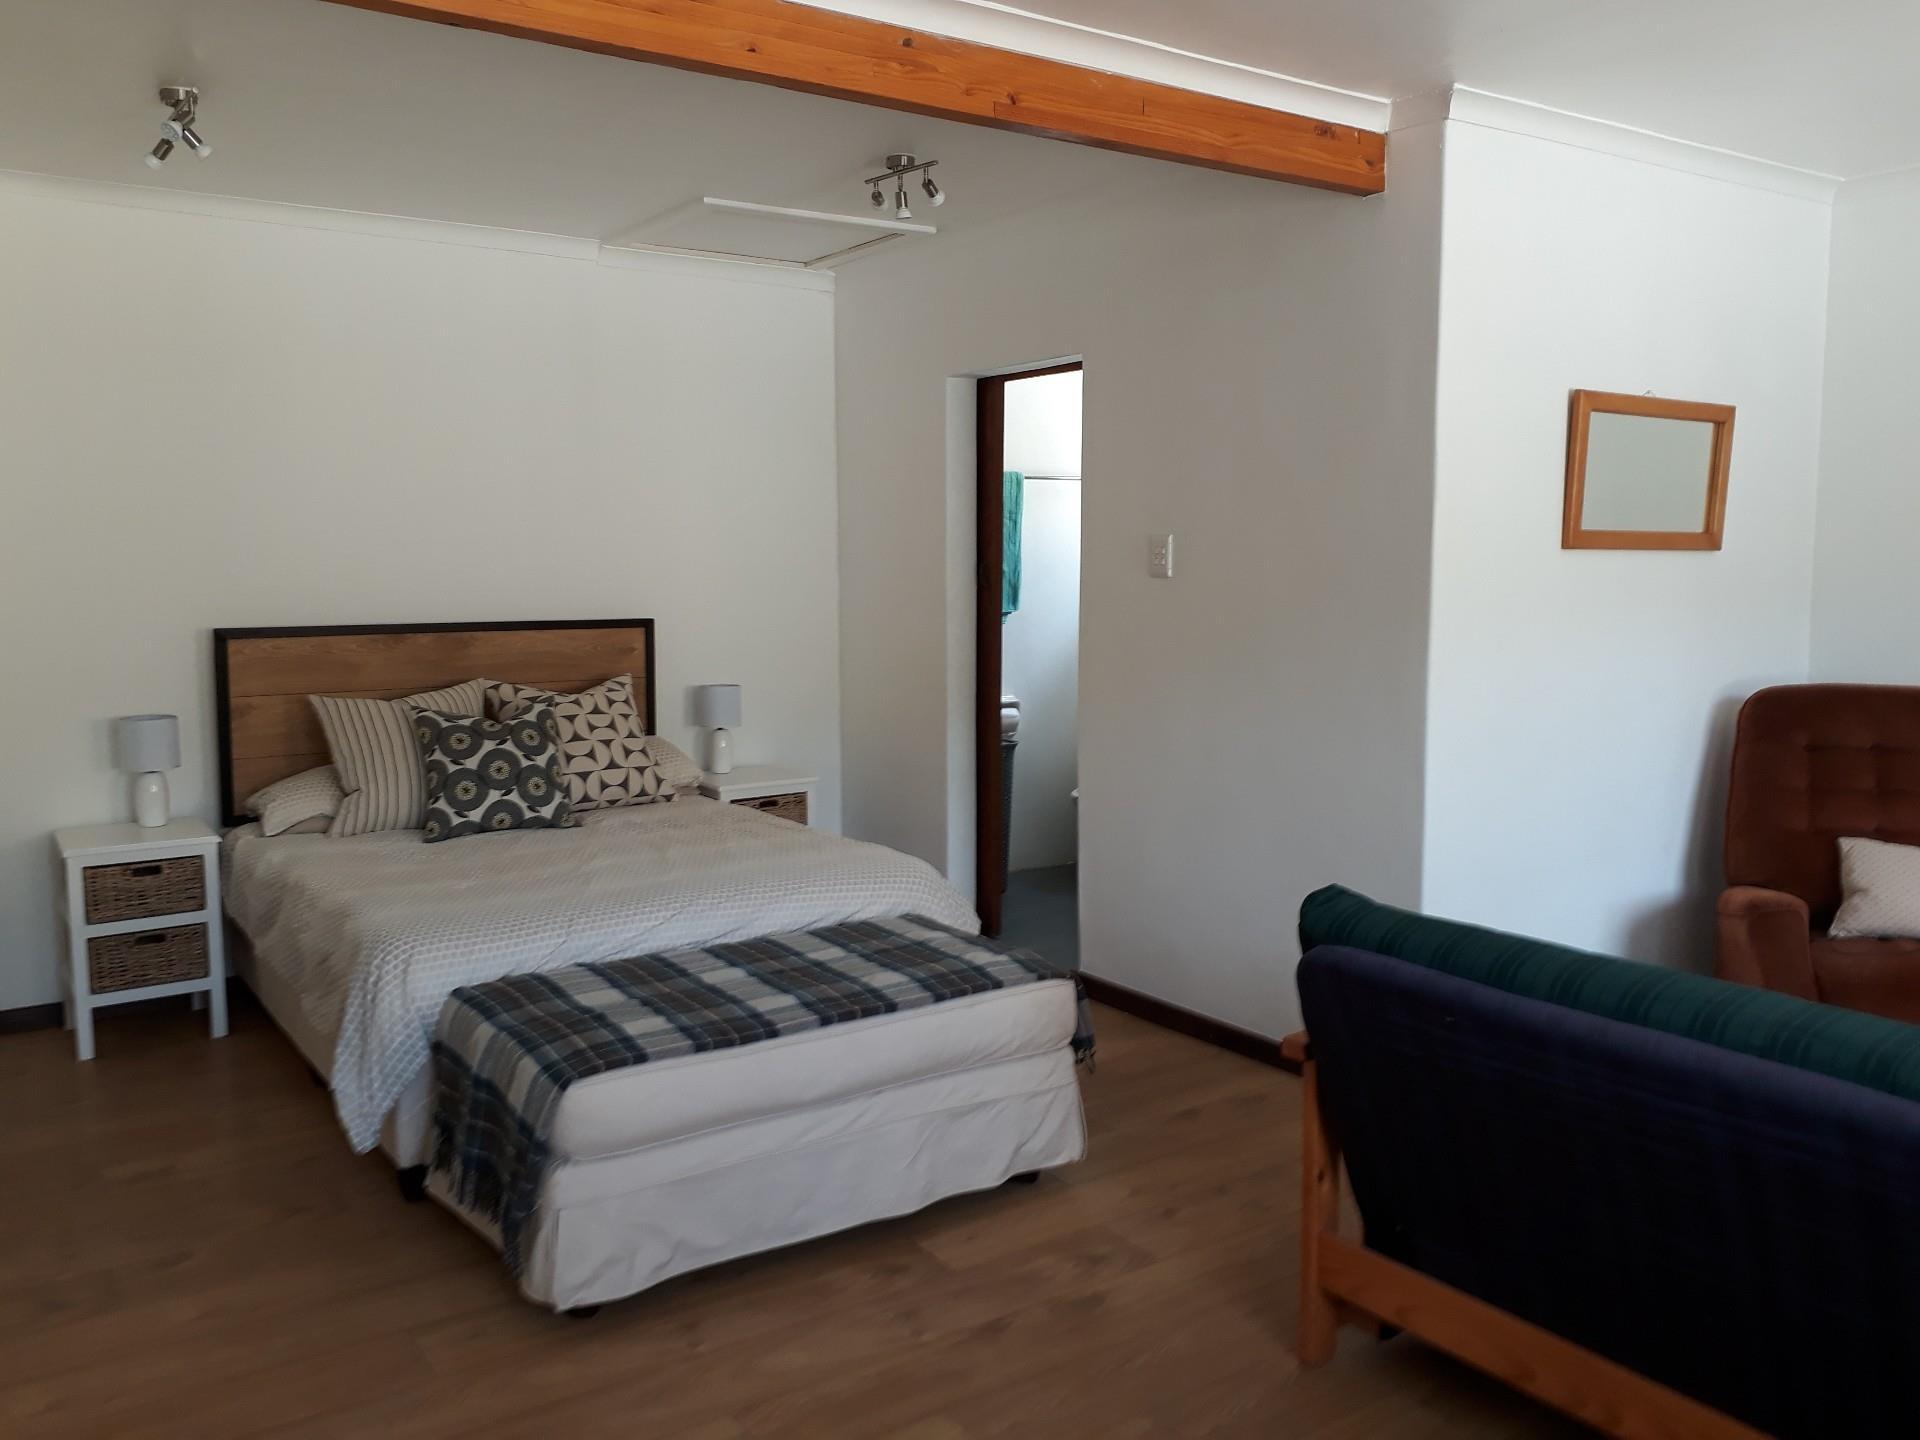 1 Bedroom Apartment / Flat To Rent in Tokai